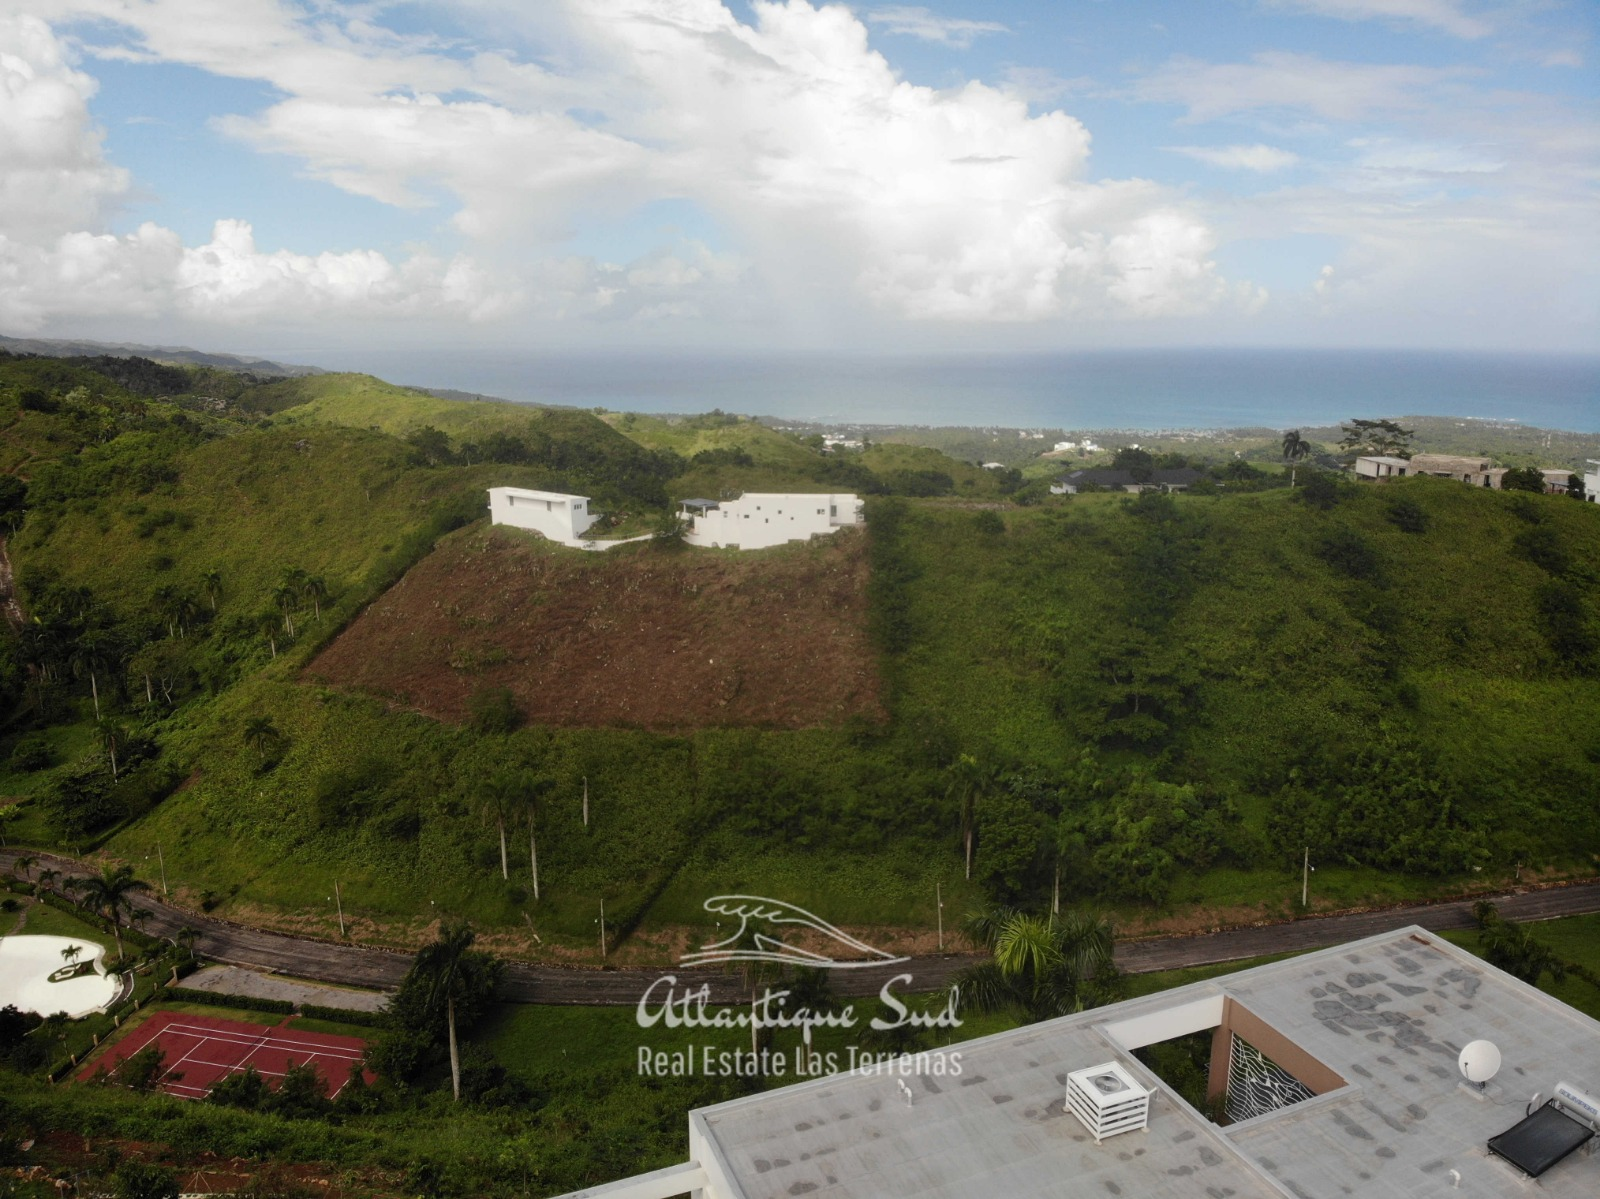 Hillside Lots for sale in Las Terrenas23.jpeg